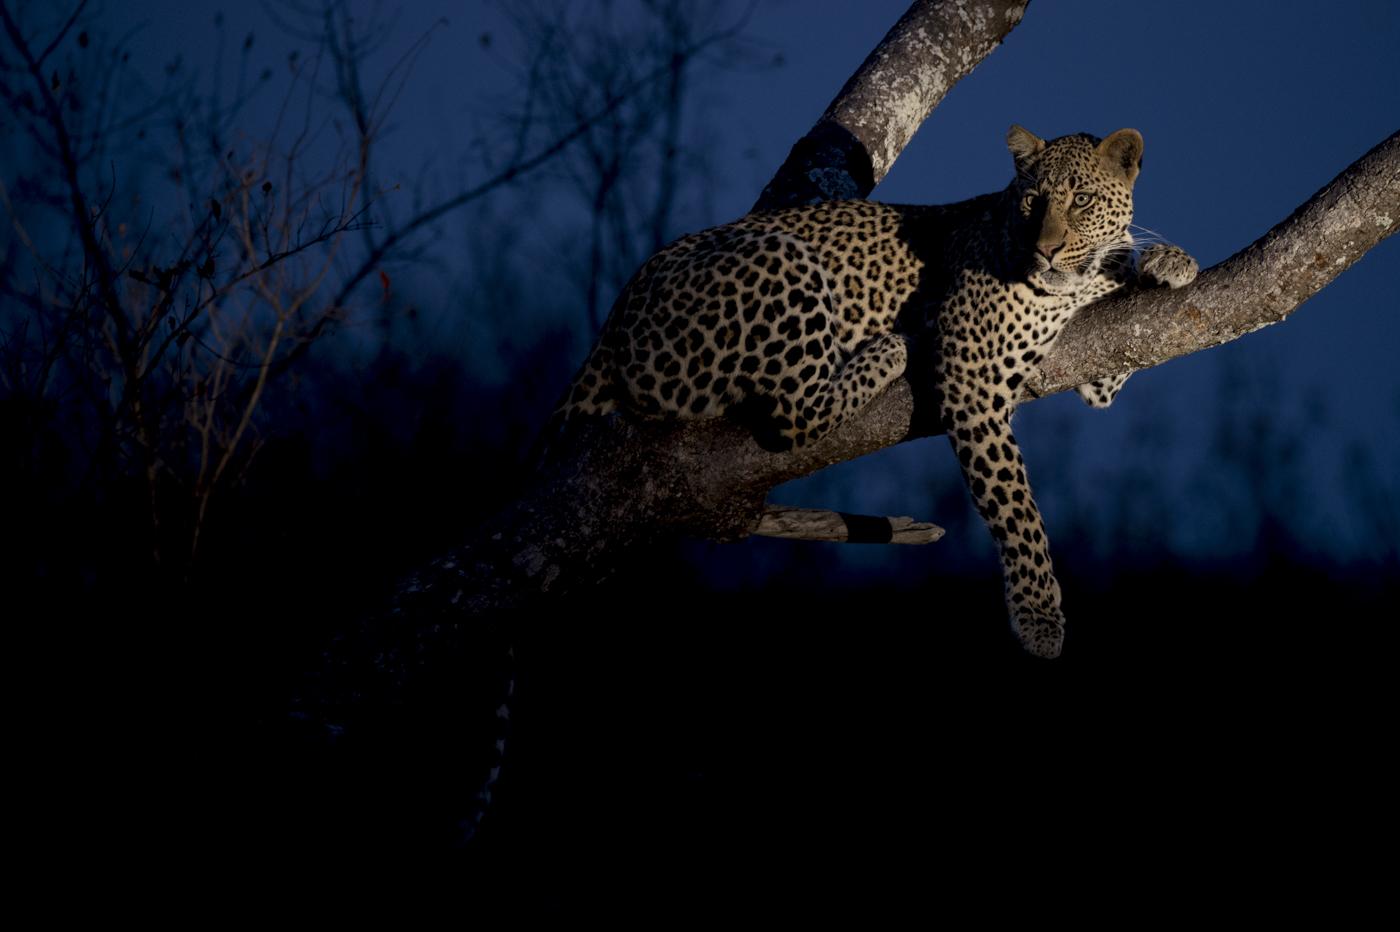 leopard tungsten side